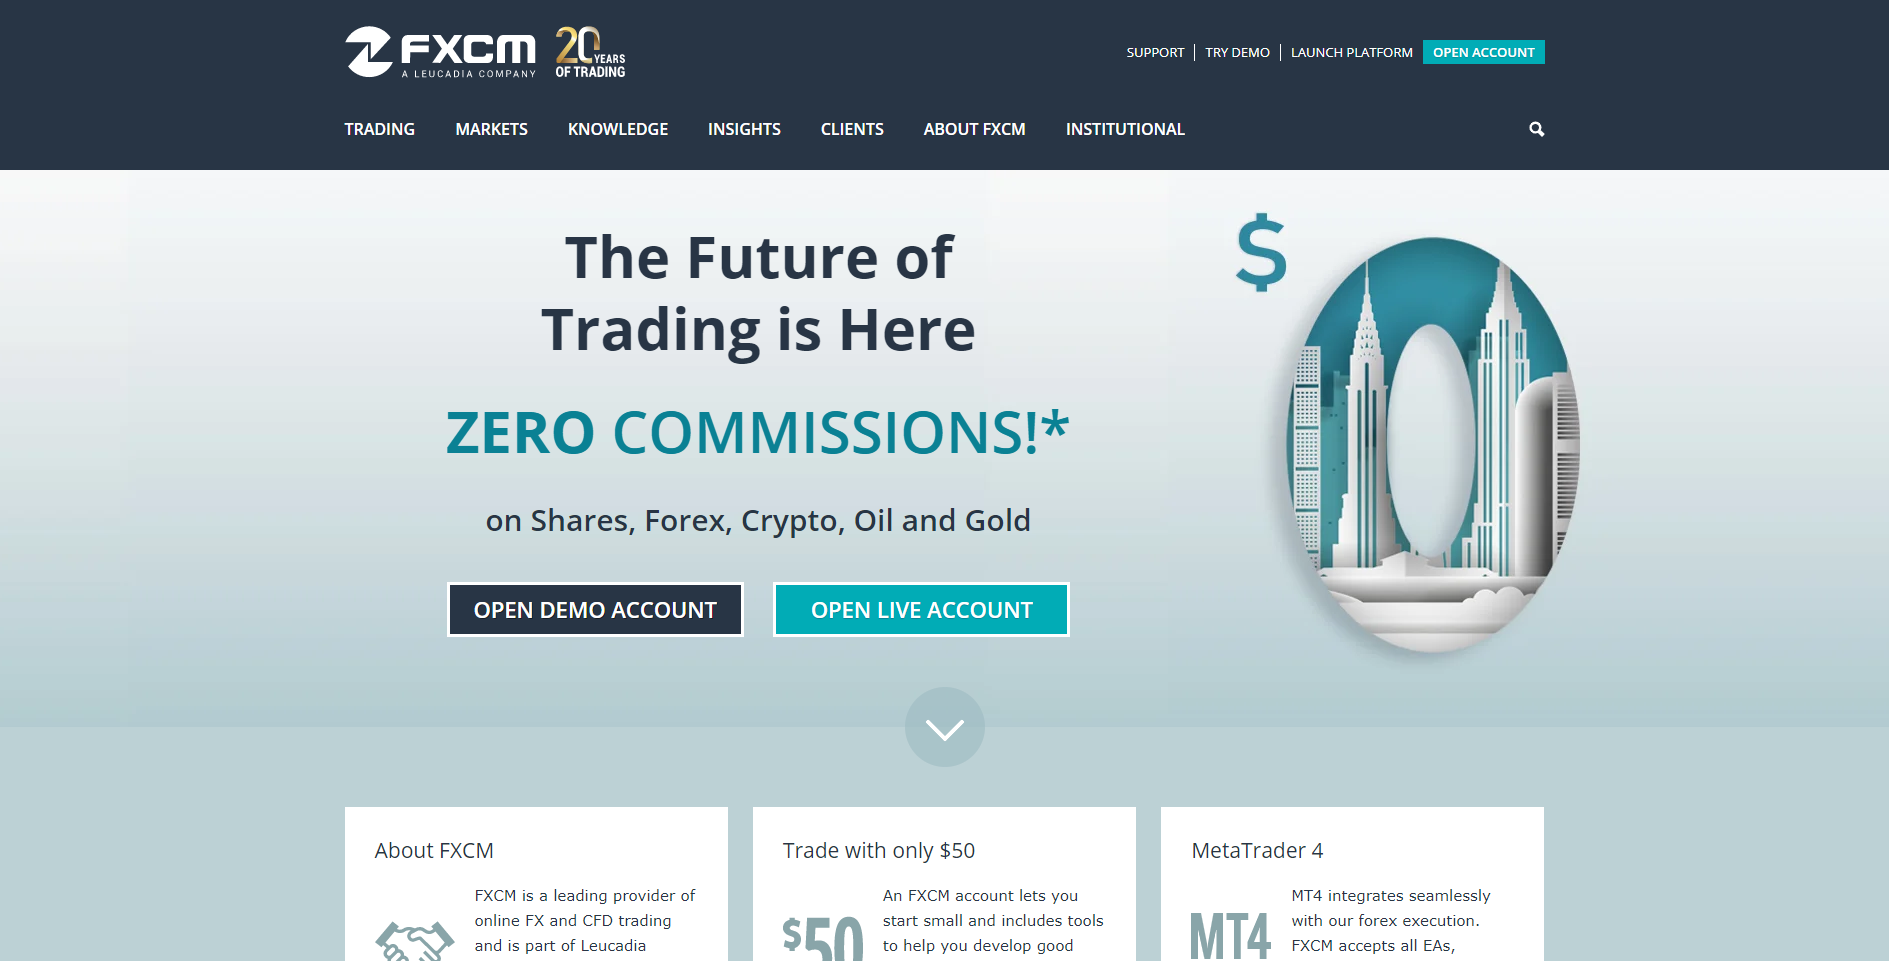 FXCM forex broker in Japan